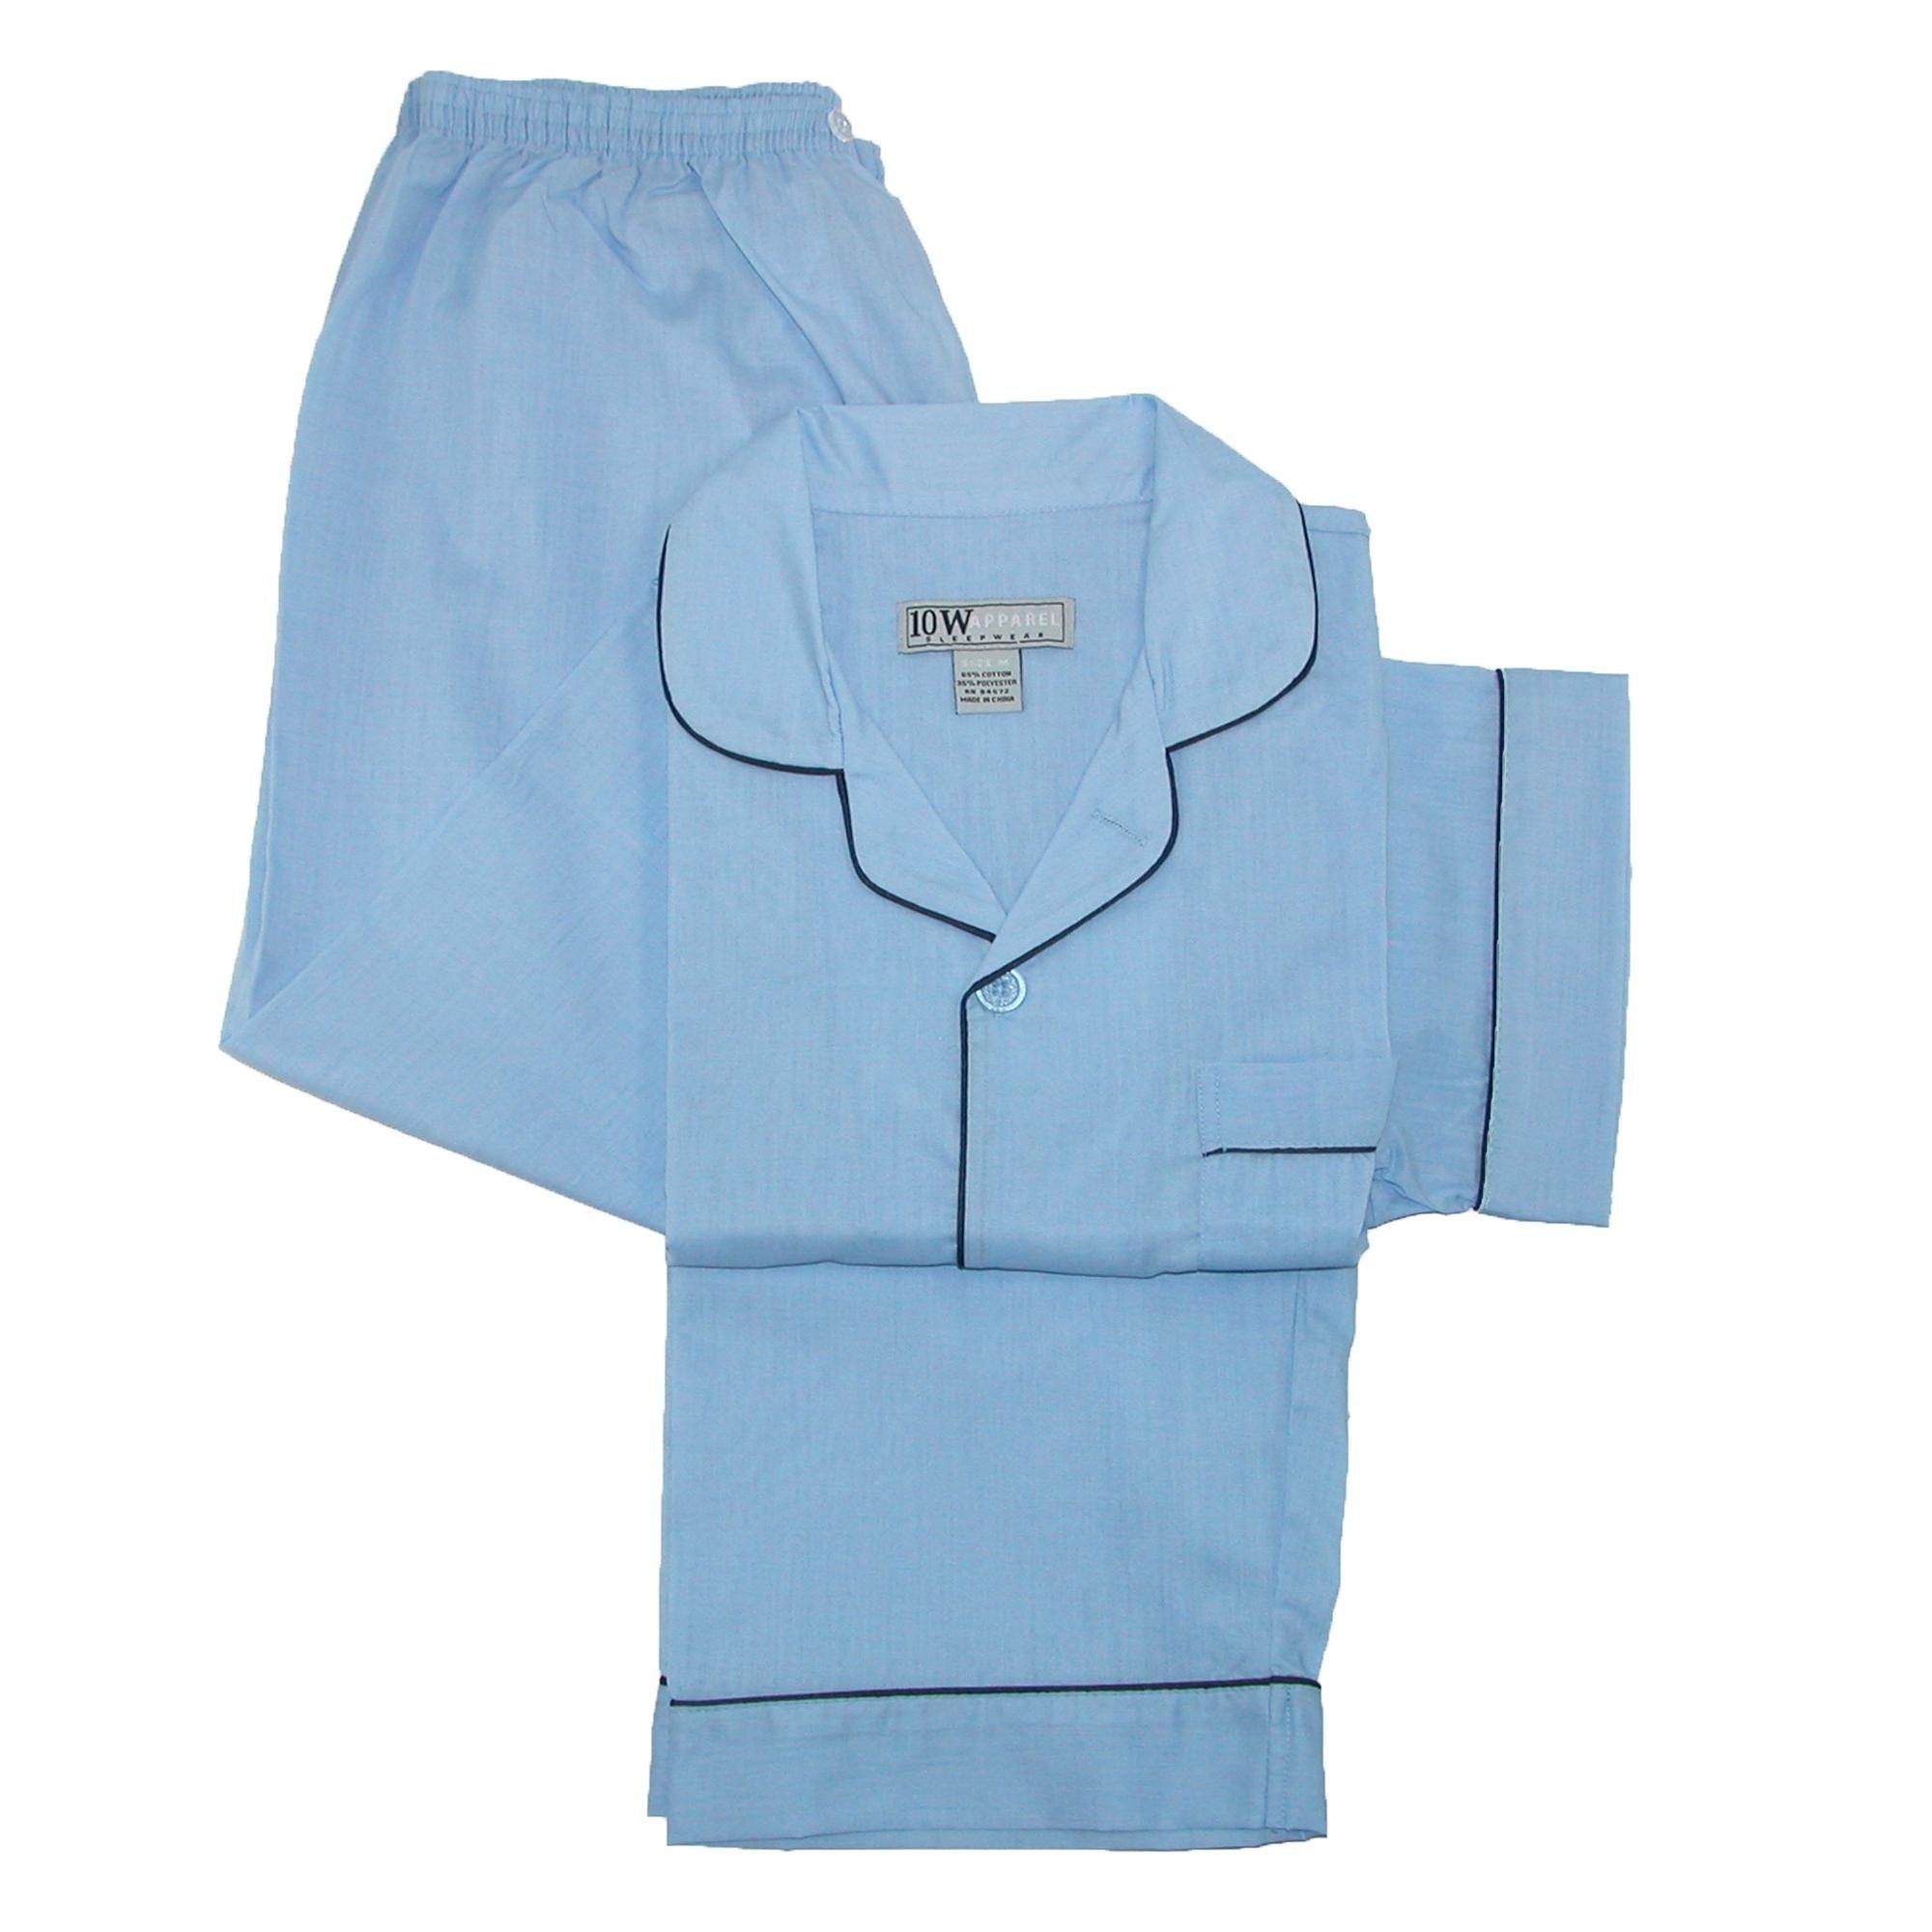 e64c6e247 Shop Ten West Apparel Men s Short Sleeve Long Leg Solid Pajama Set ...